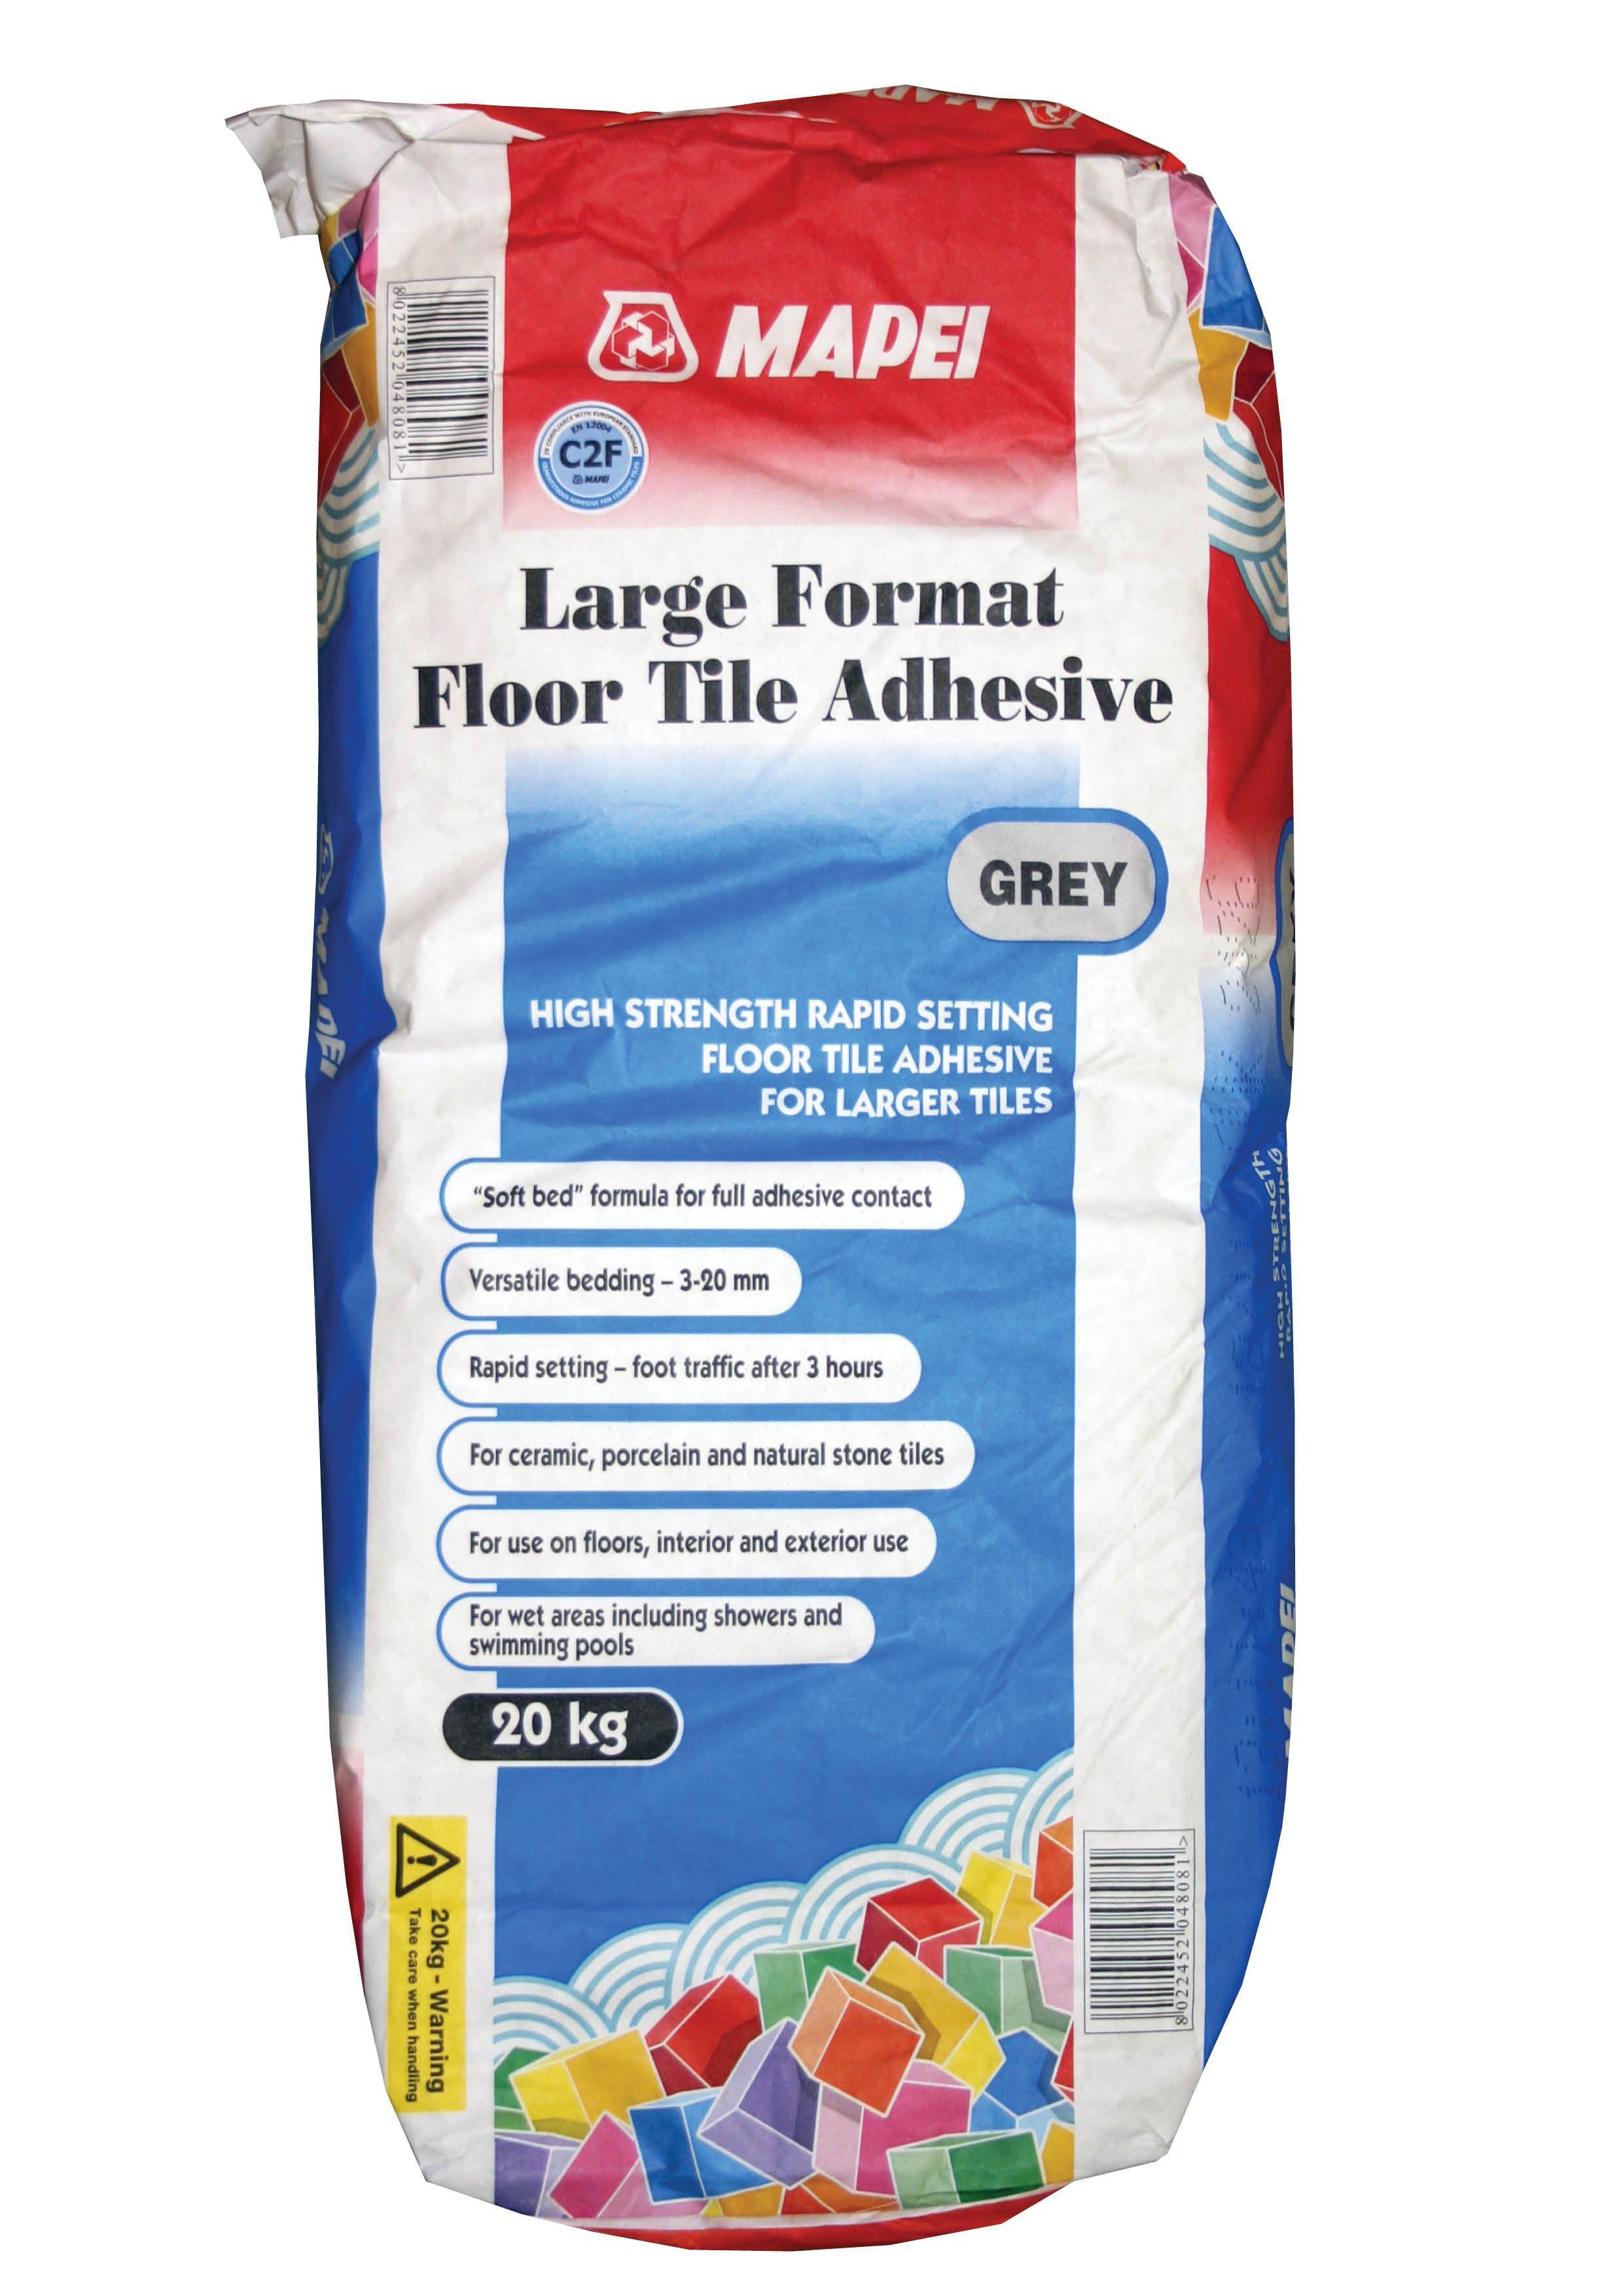 Mapei large format powder floor tile adhesive grey 20kg mapei large format powder floor tile adhesive grey 20kg departments diy at bq dailygadgetfo Choice Image